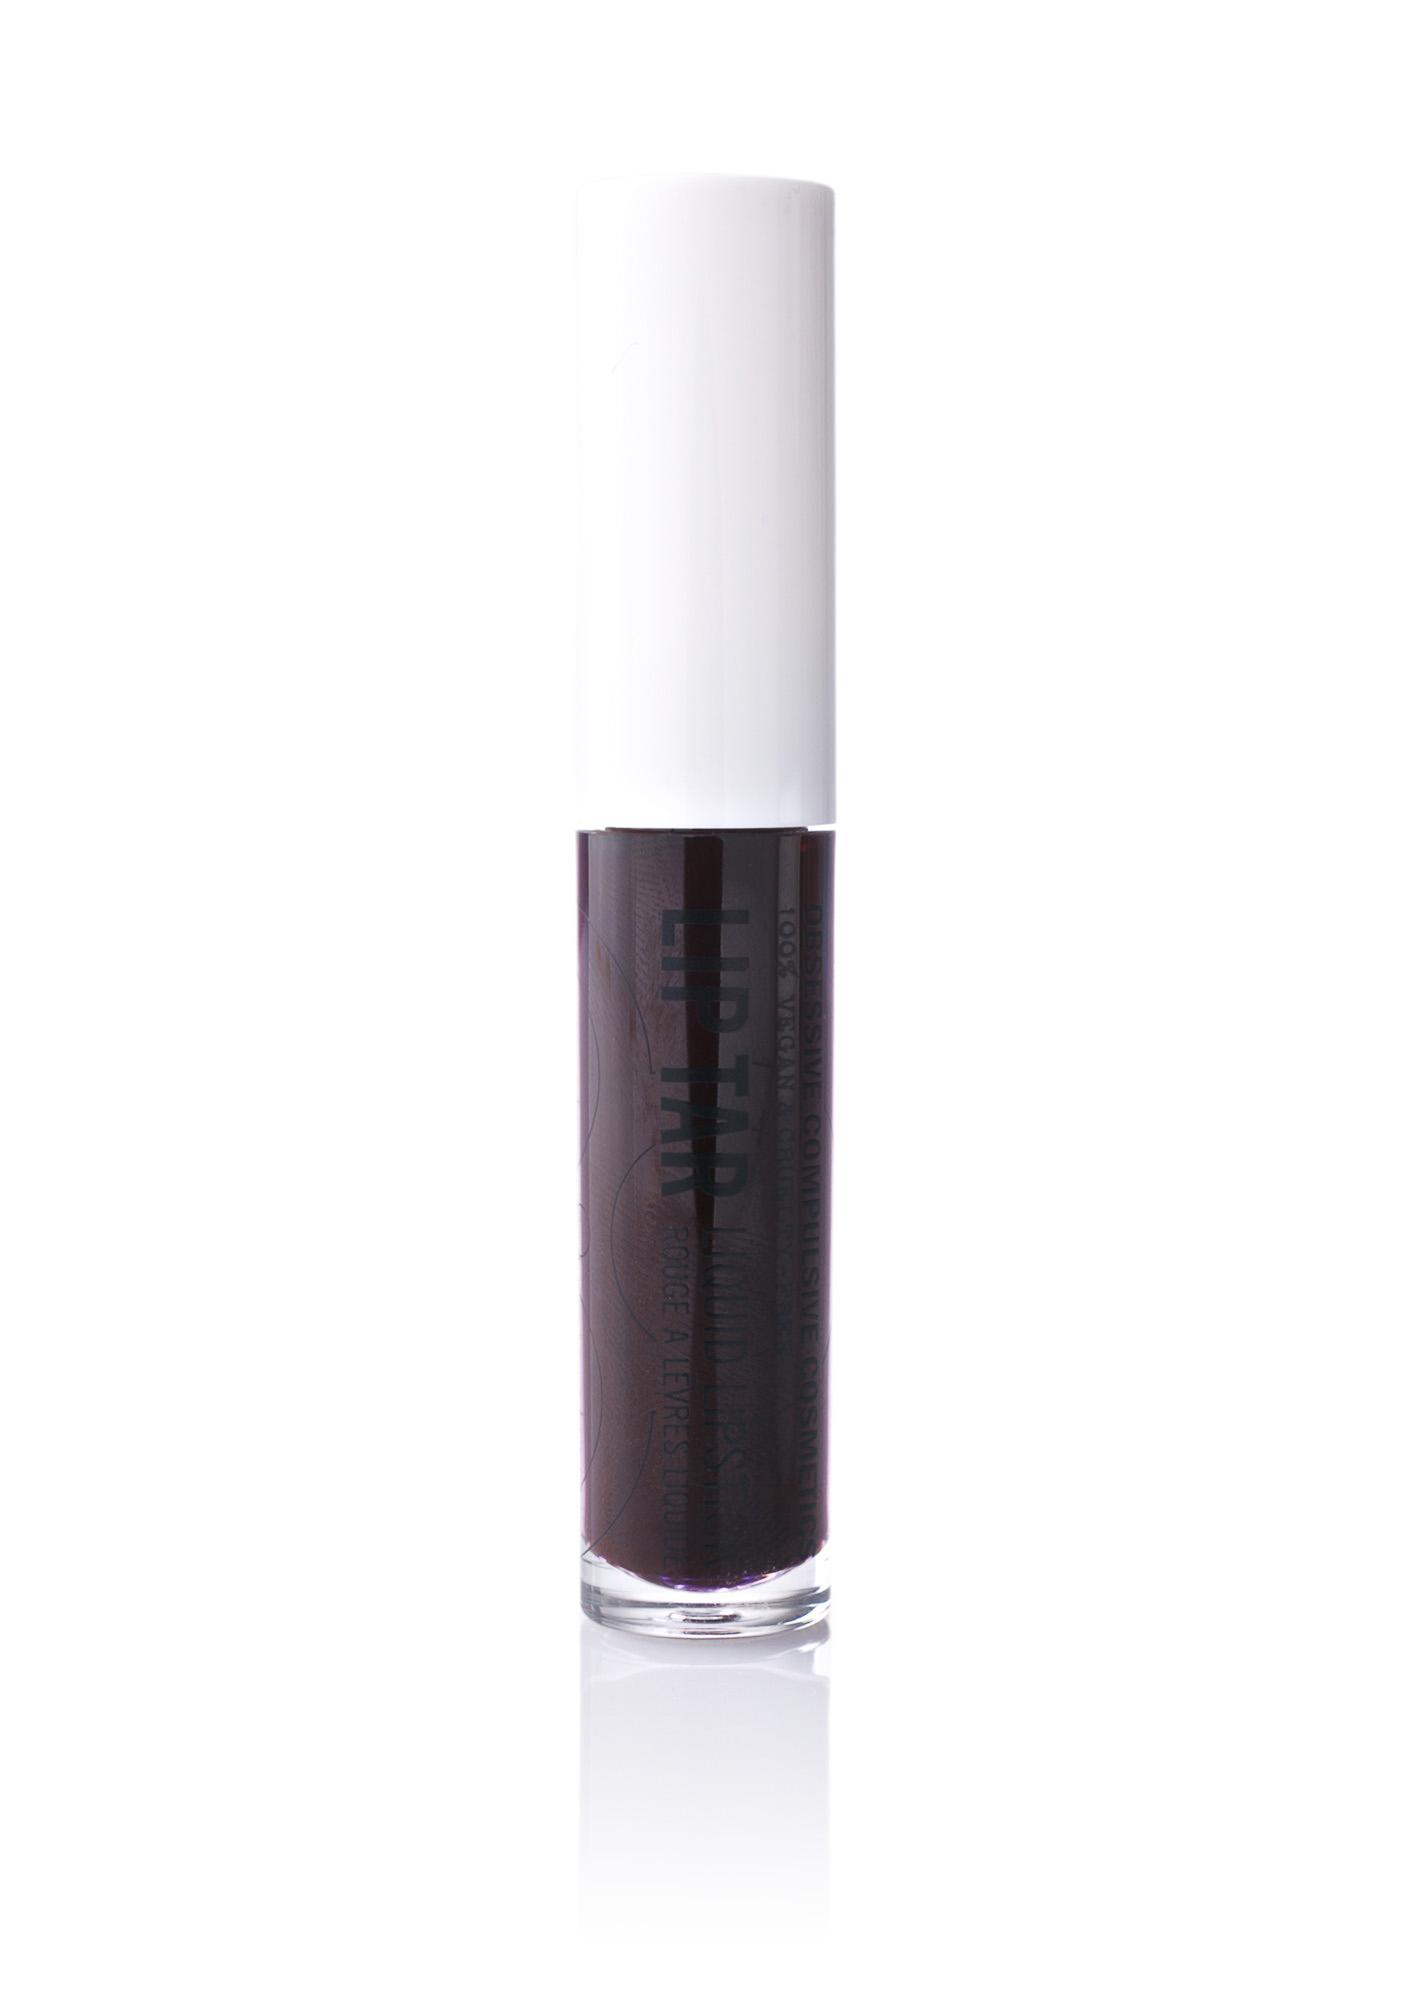 Obsessive Compulsive Cosmetics Black Dahlia Lip Tar